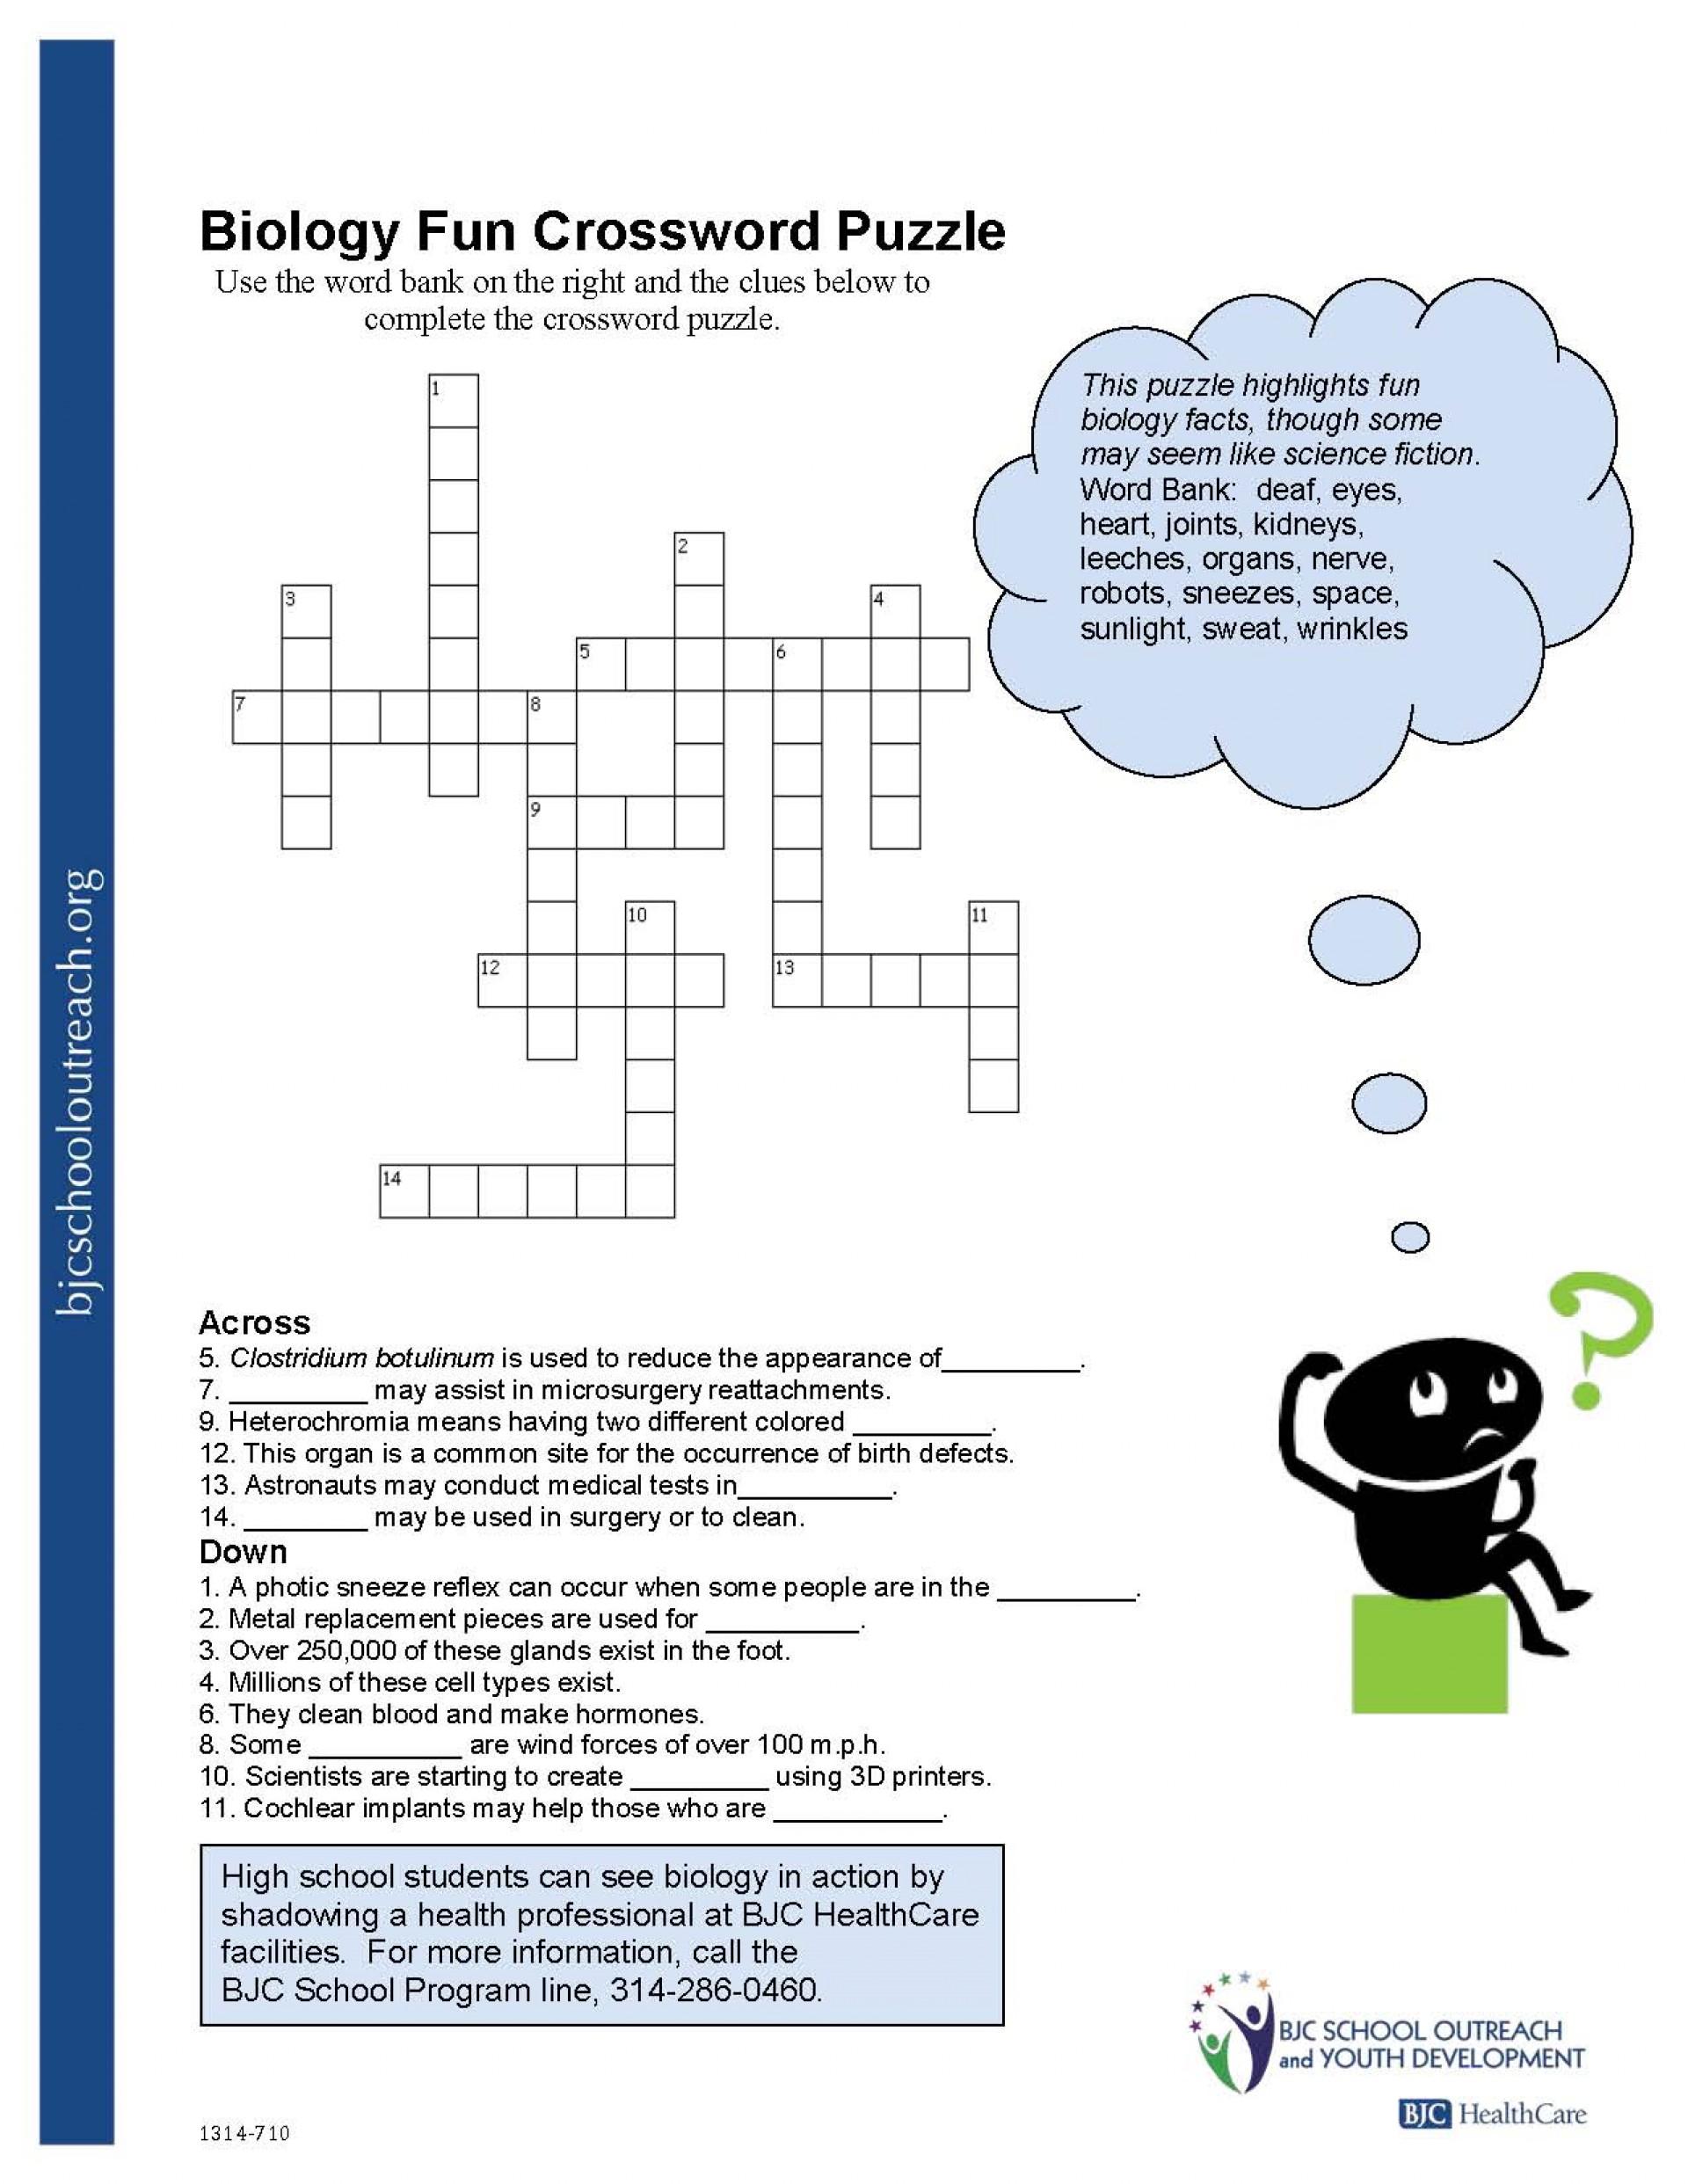 Enjoyable Esl Printable Crossword Puzzle Worksheets With Pictures - Printable Crossword Puzzle With Word Bank